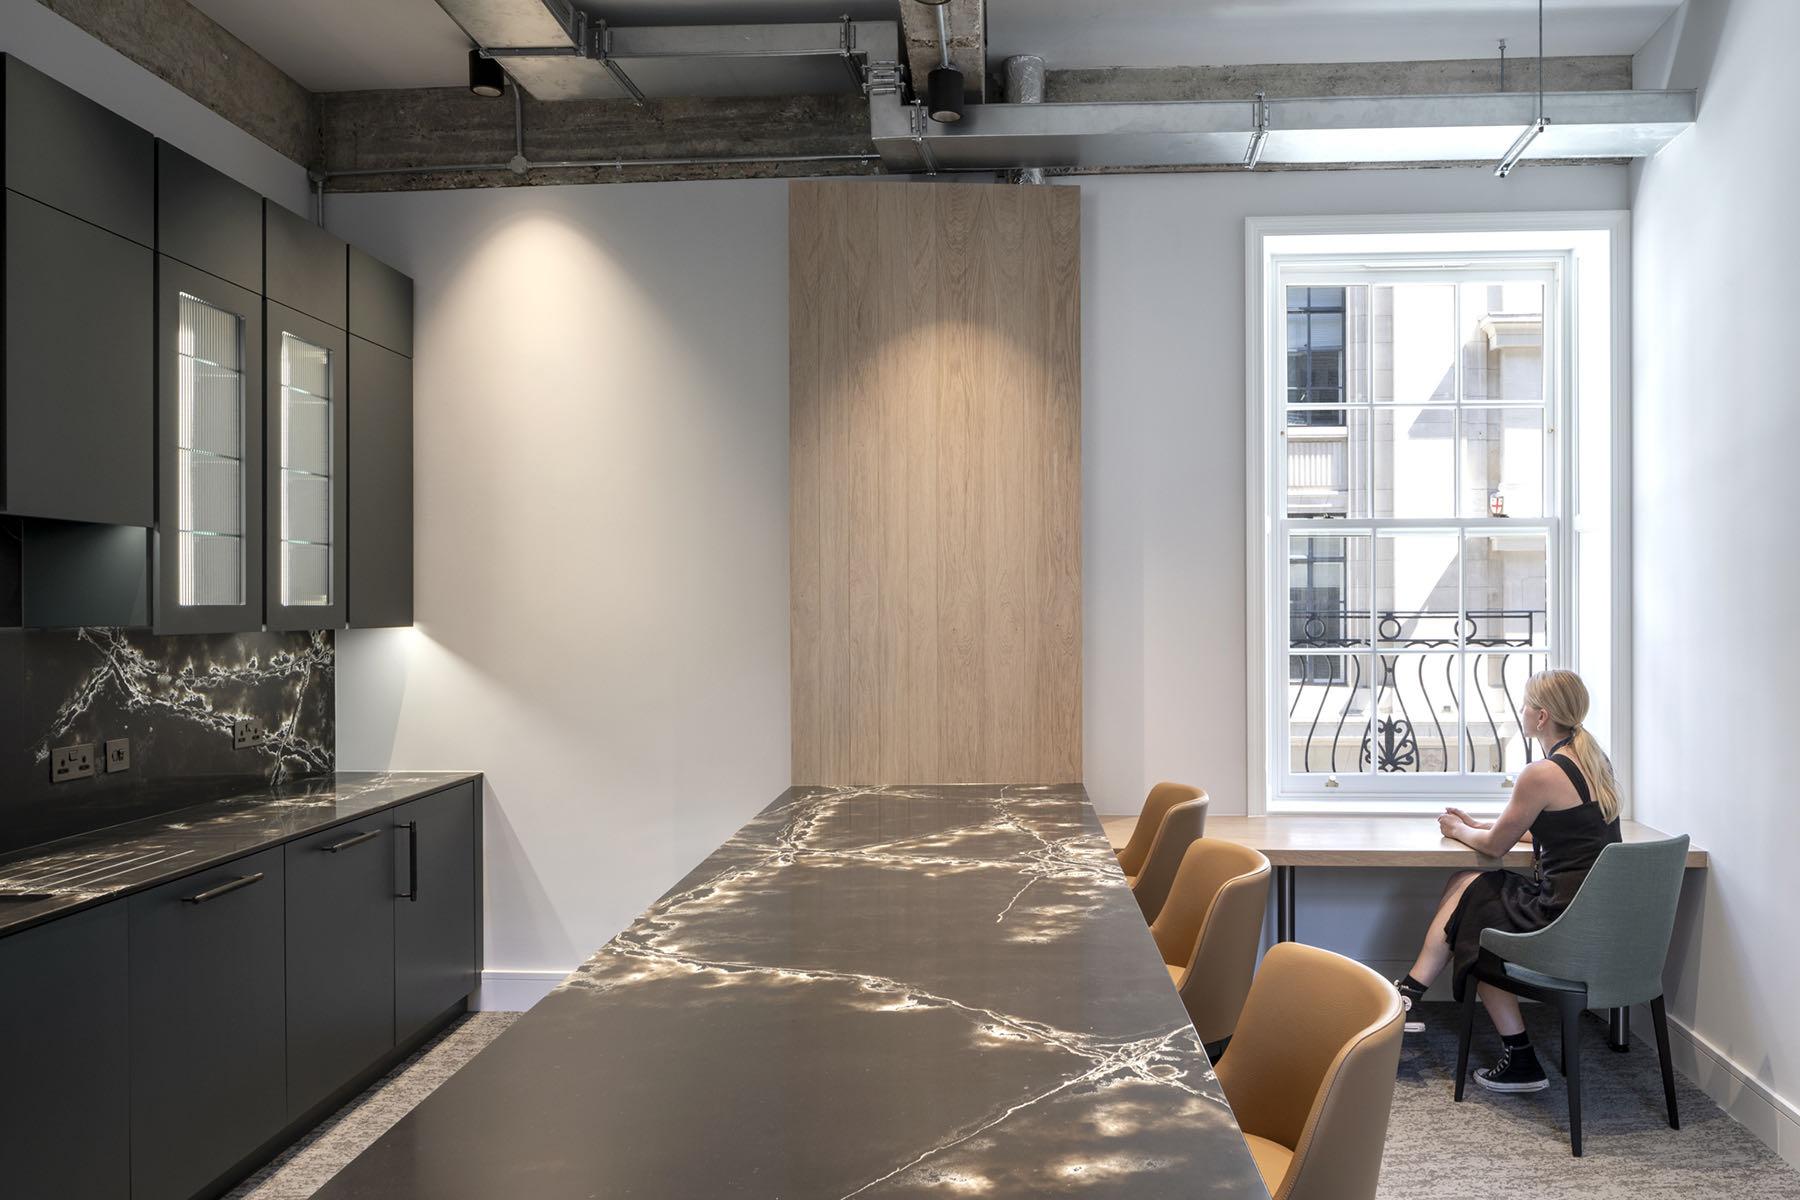 fredericks-place-london-office-12